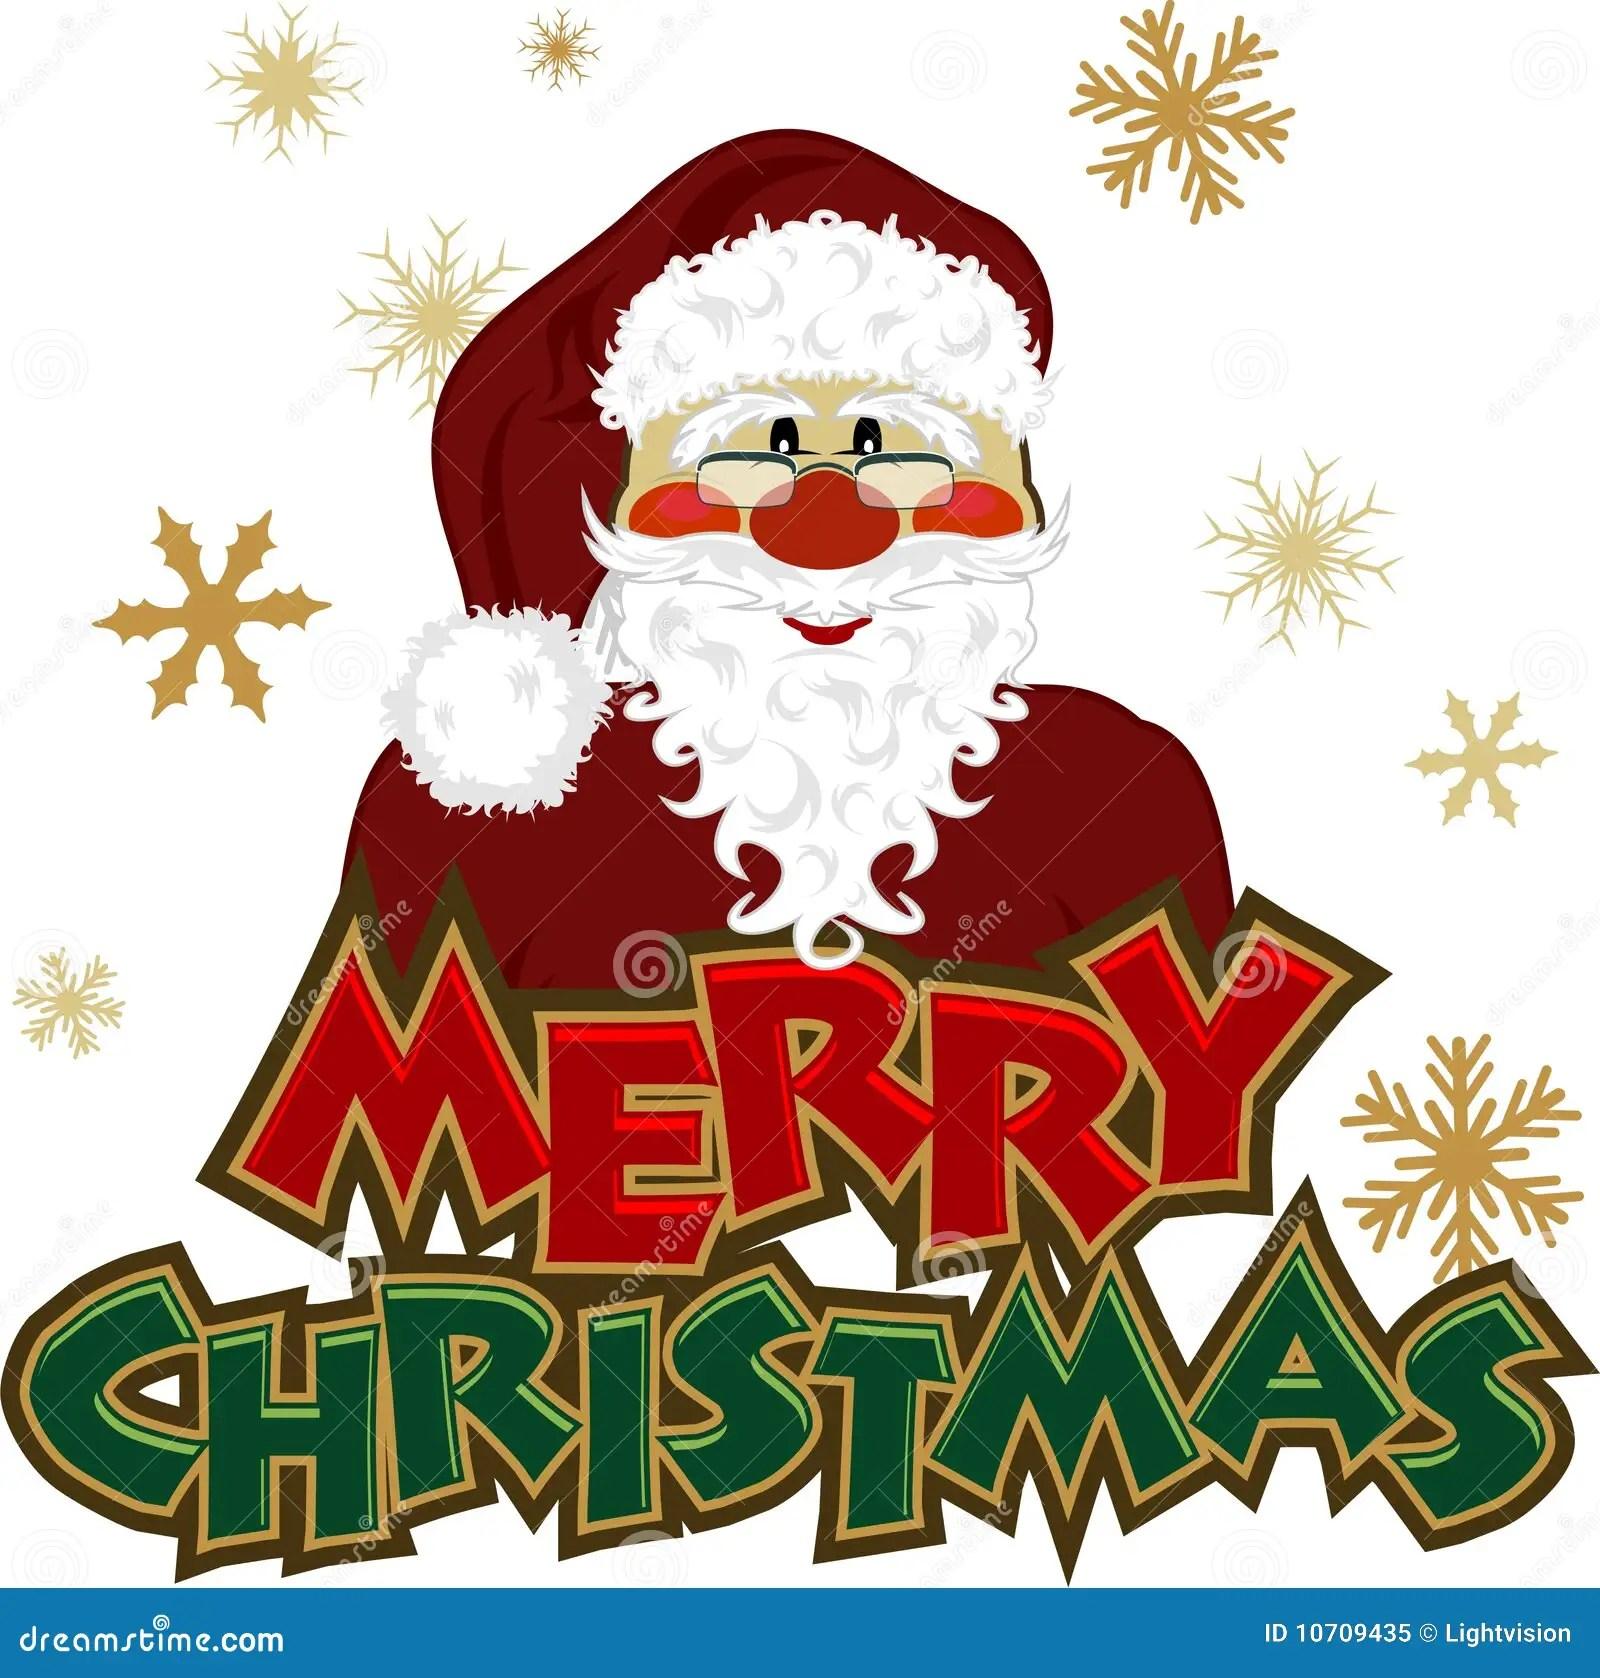 Santa Icon Royalty Free Stock Photo Image 10709435